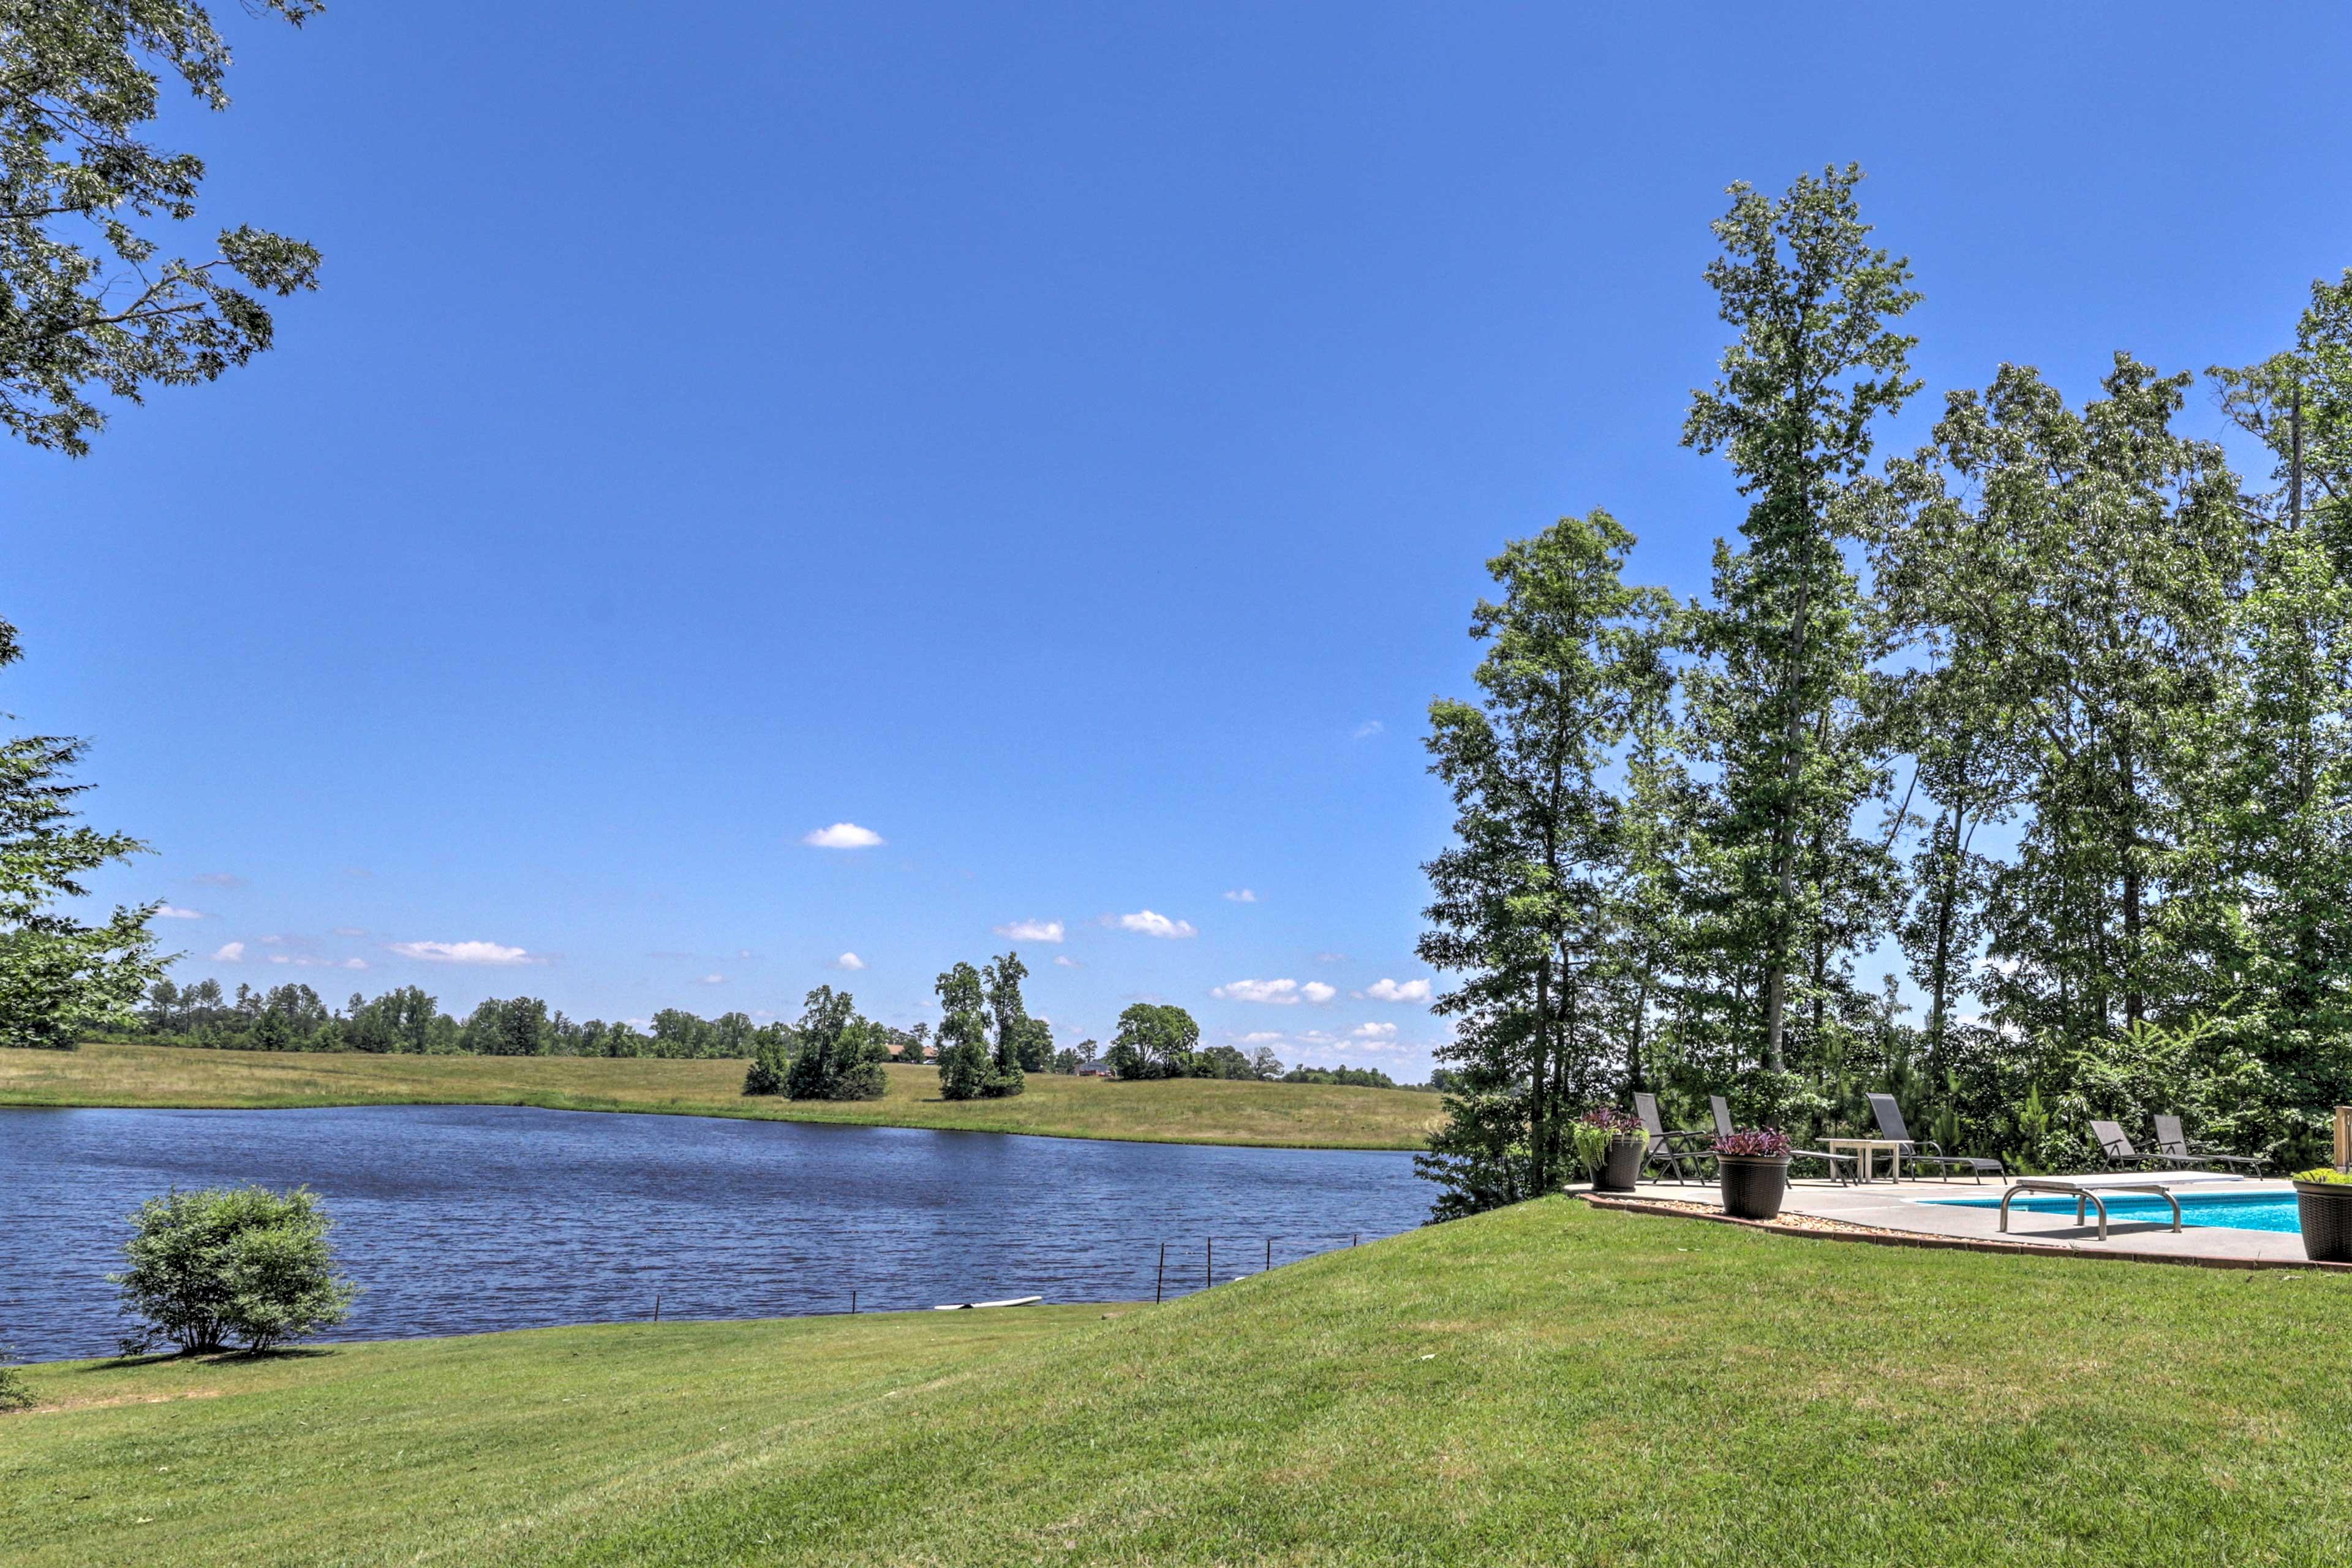 Enjoy long days fishing and boating on the beautiful lake.